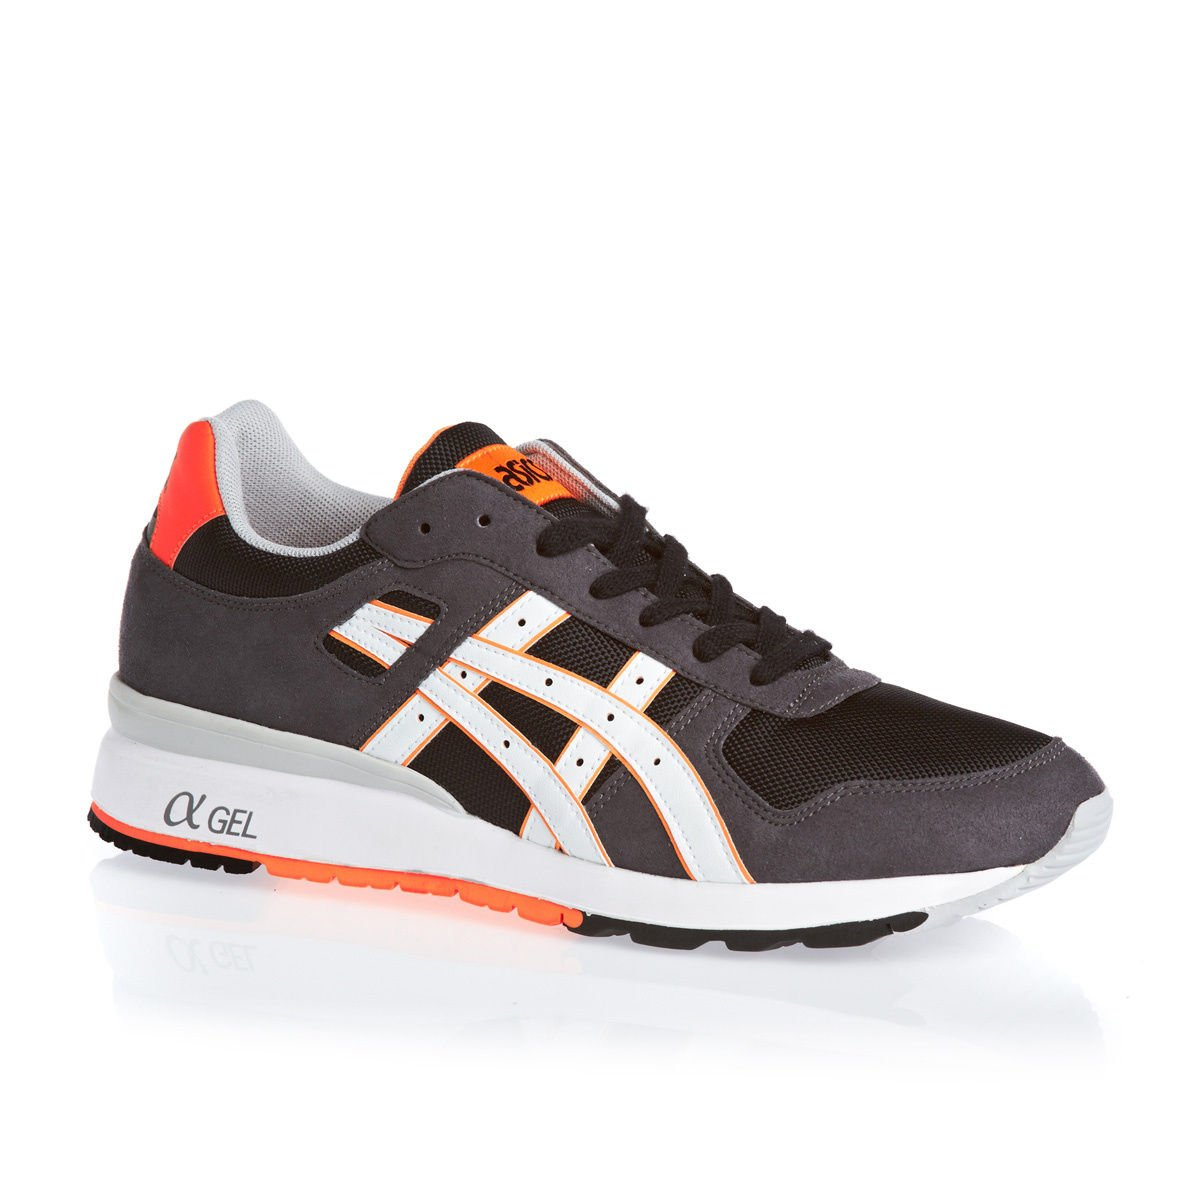 Asics GT-II, Zapatillas de Running Unisex Adulto 39.5 EU|Negro / Naranja